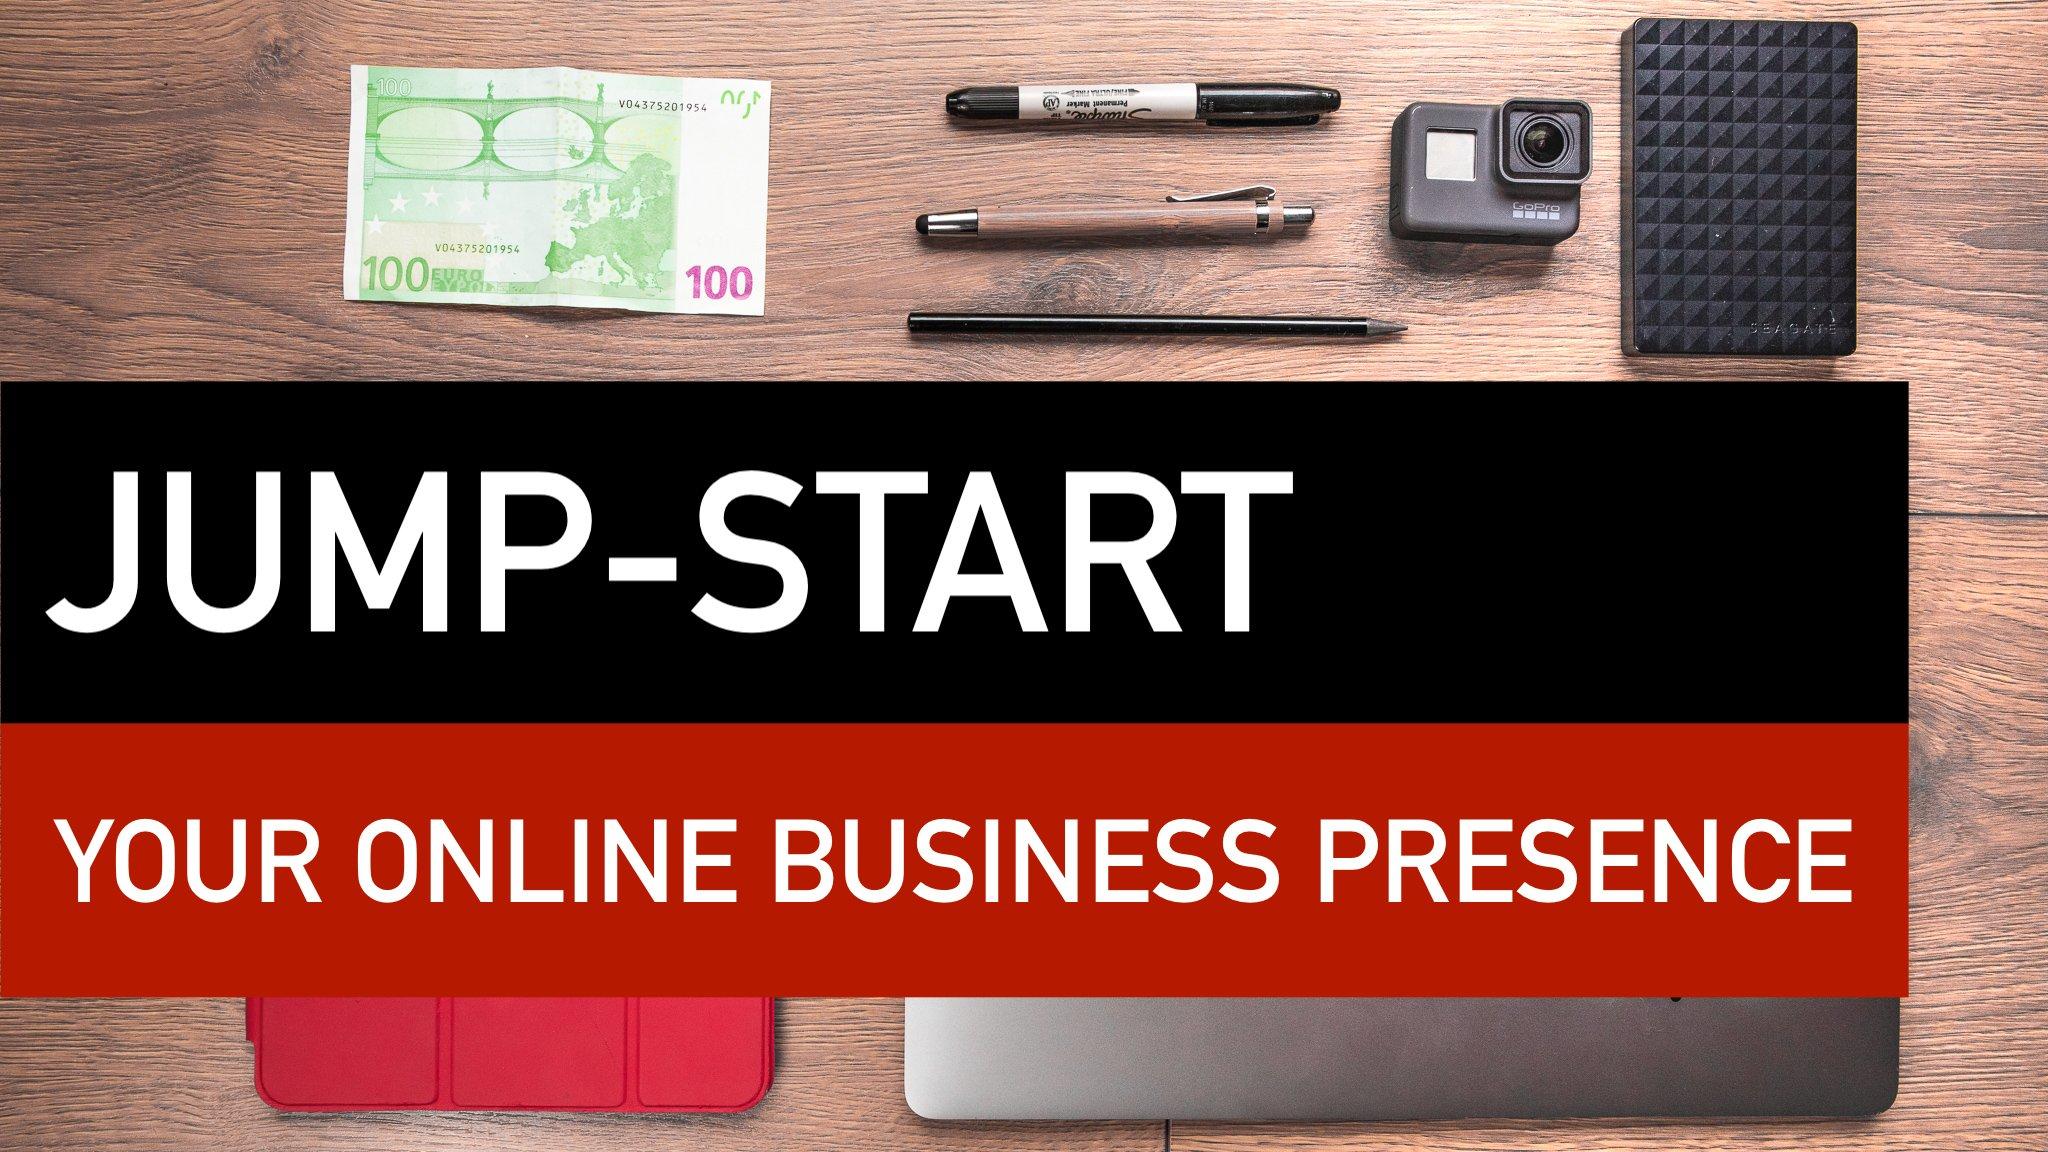 JUMPSTART YOUR ONLINE BUSINESS PRESENCE